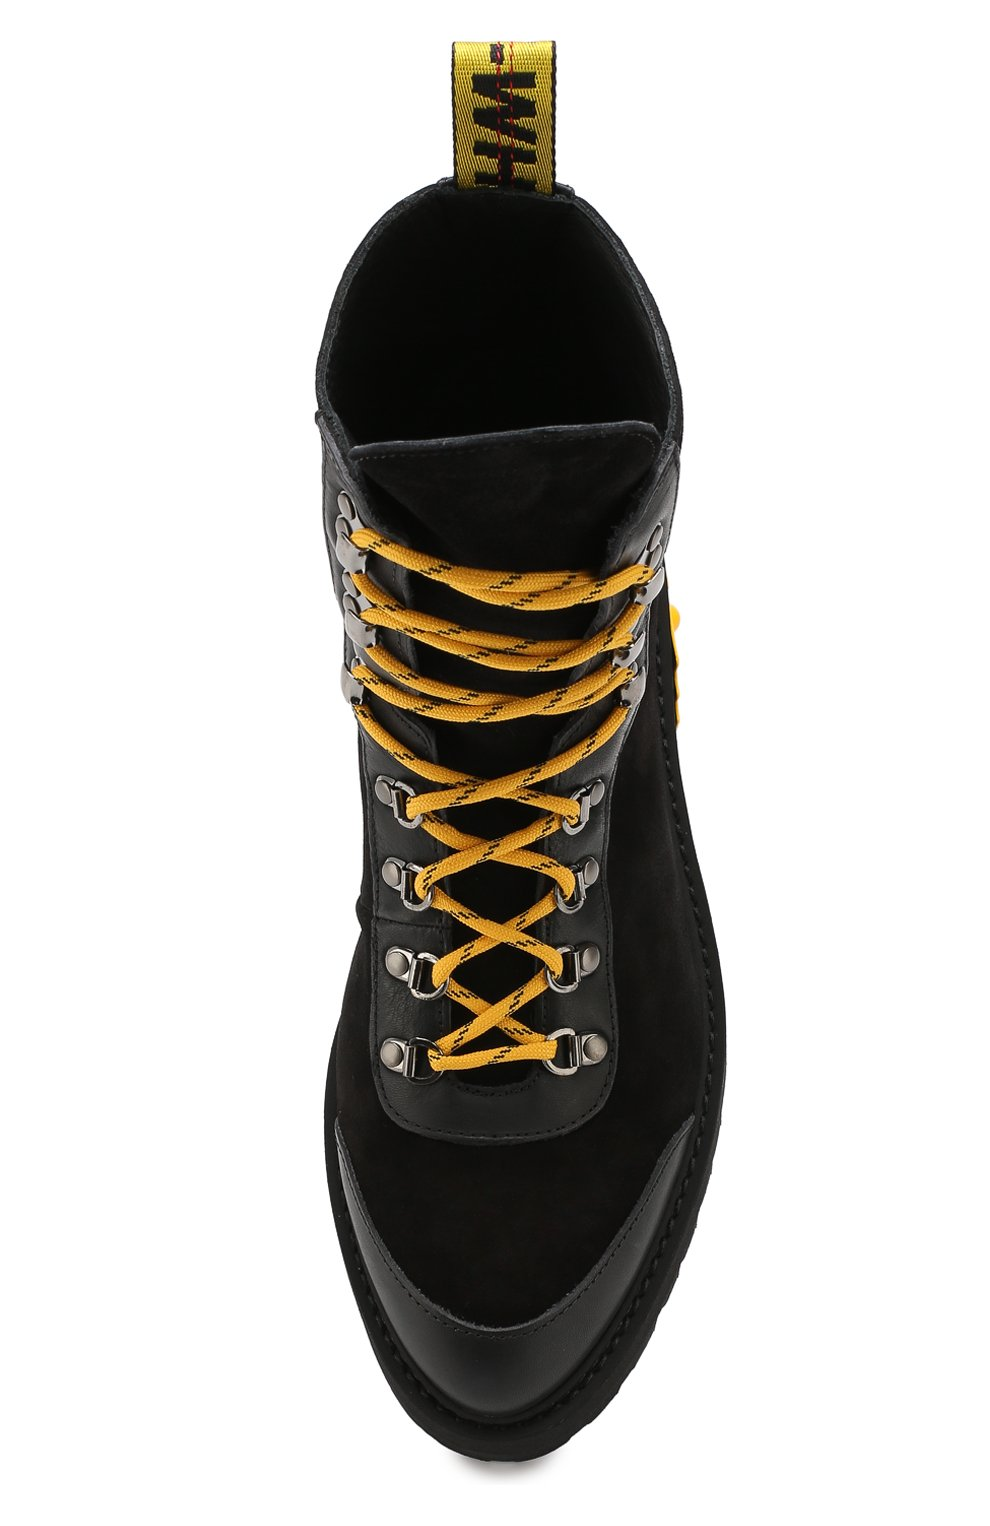 Мужские замшевые ботинки OFF-WHITE черного цвета, арт. 0MIA121E19D680021000 | Фото 5